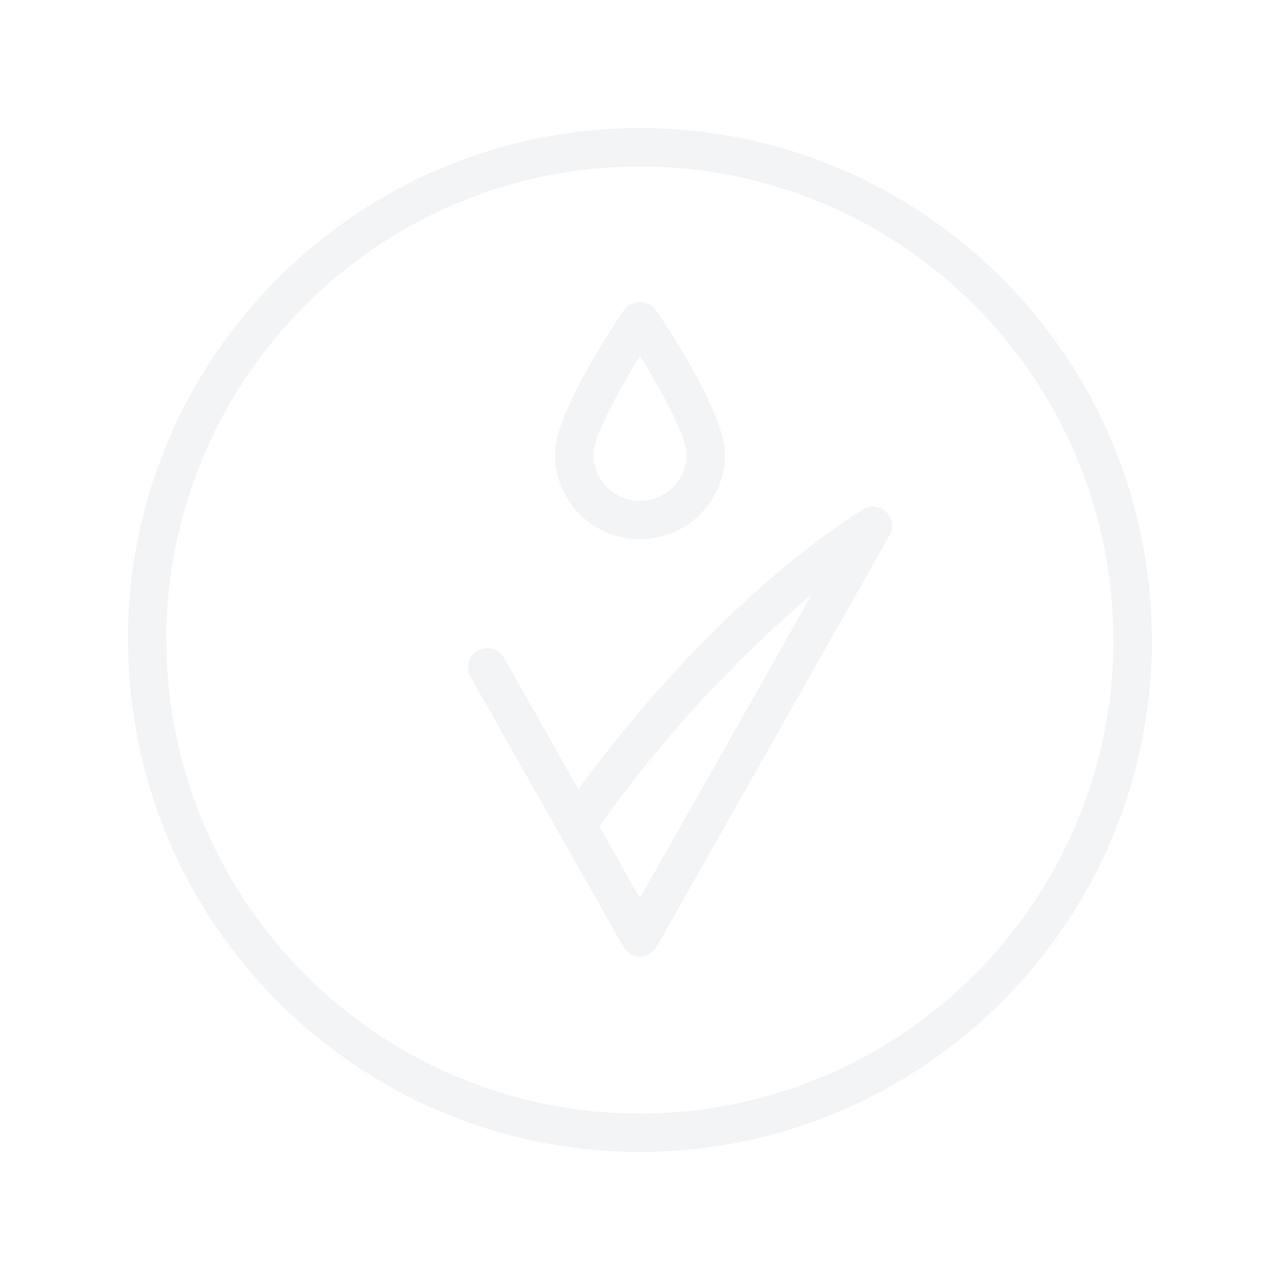 HOLIKA HOLIKA One Solution Anti-Wrinkle Ampoule 30ml